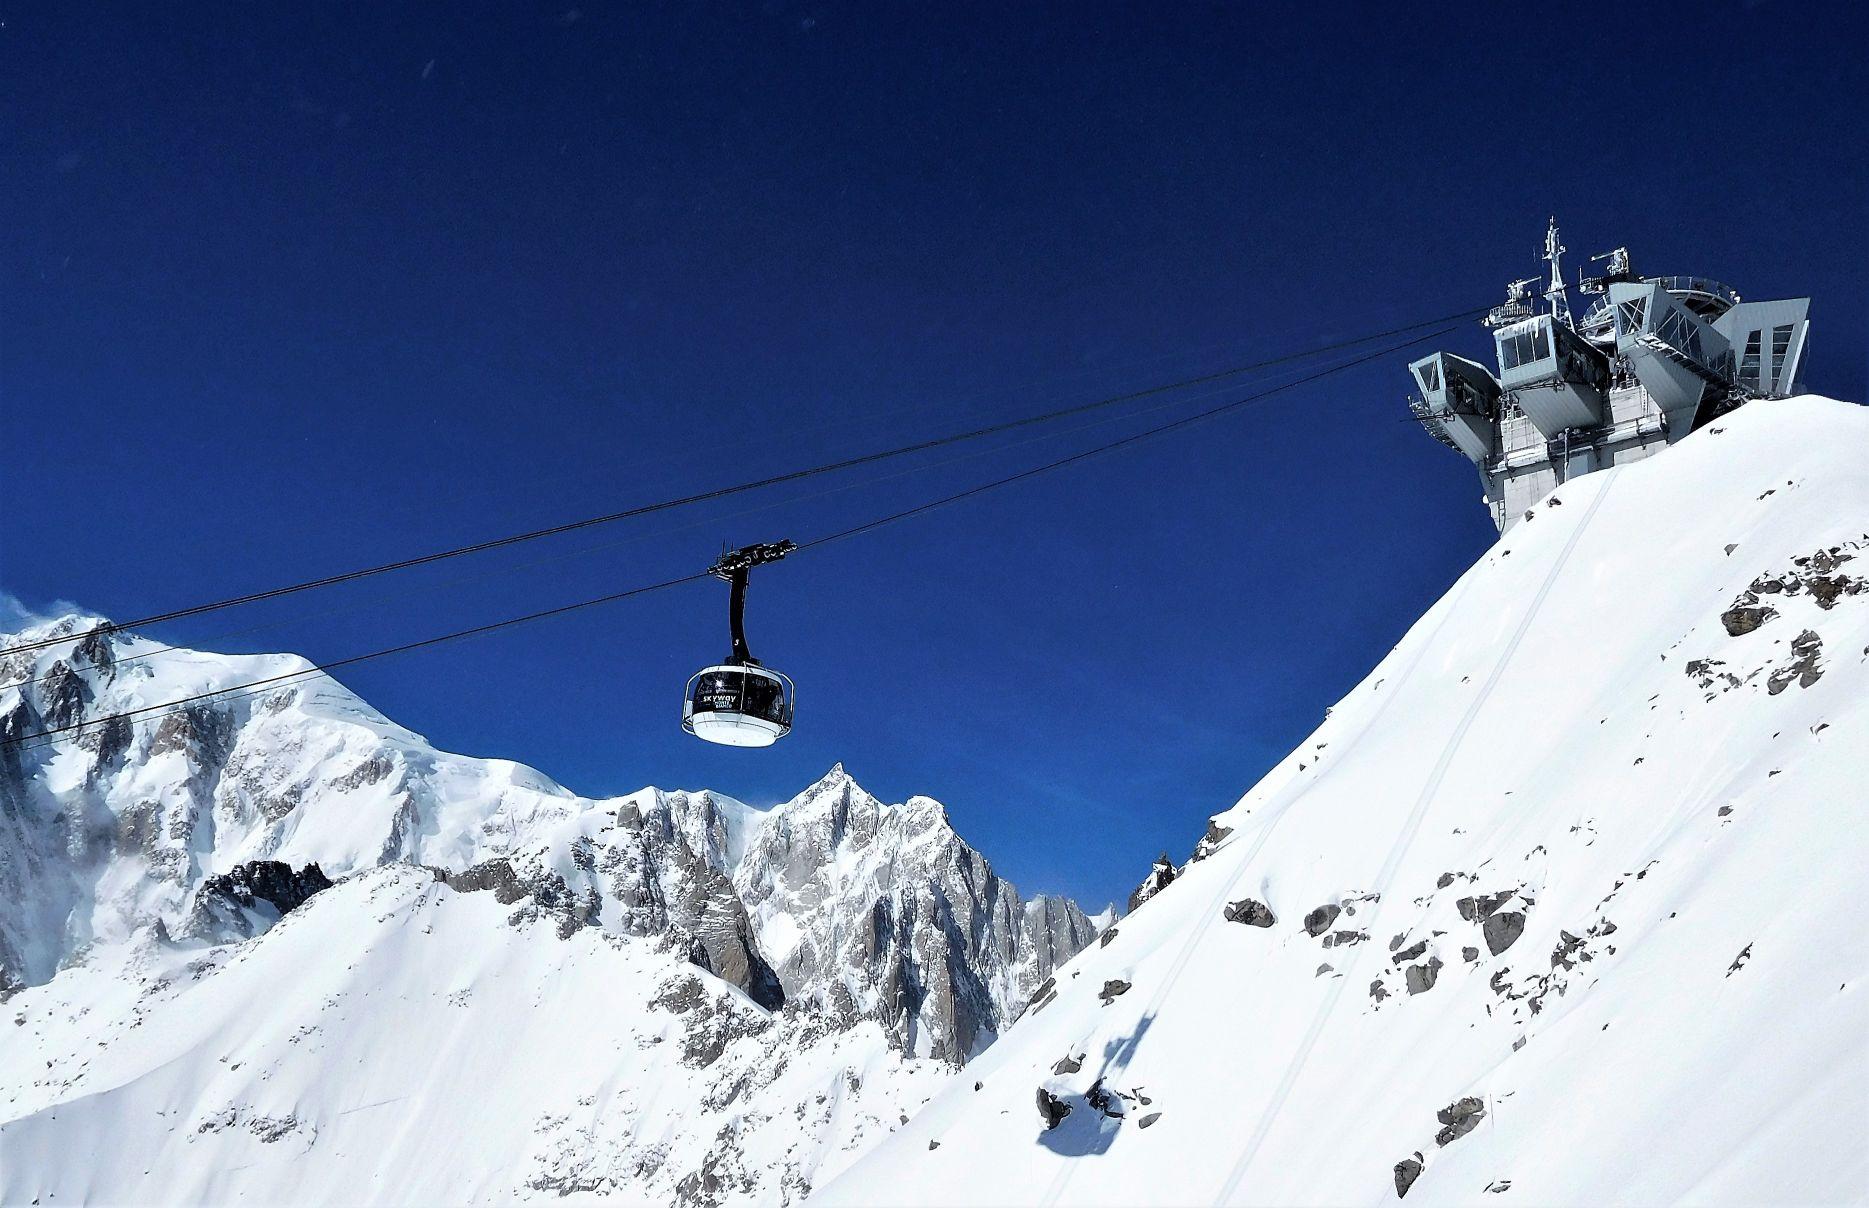 Con Skyway Monte Bianco Sul Tetto D Europa Viavaiblog It